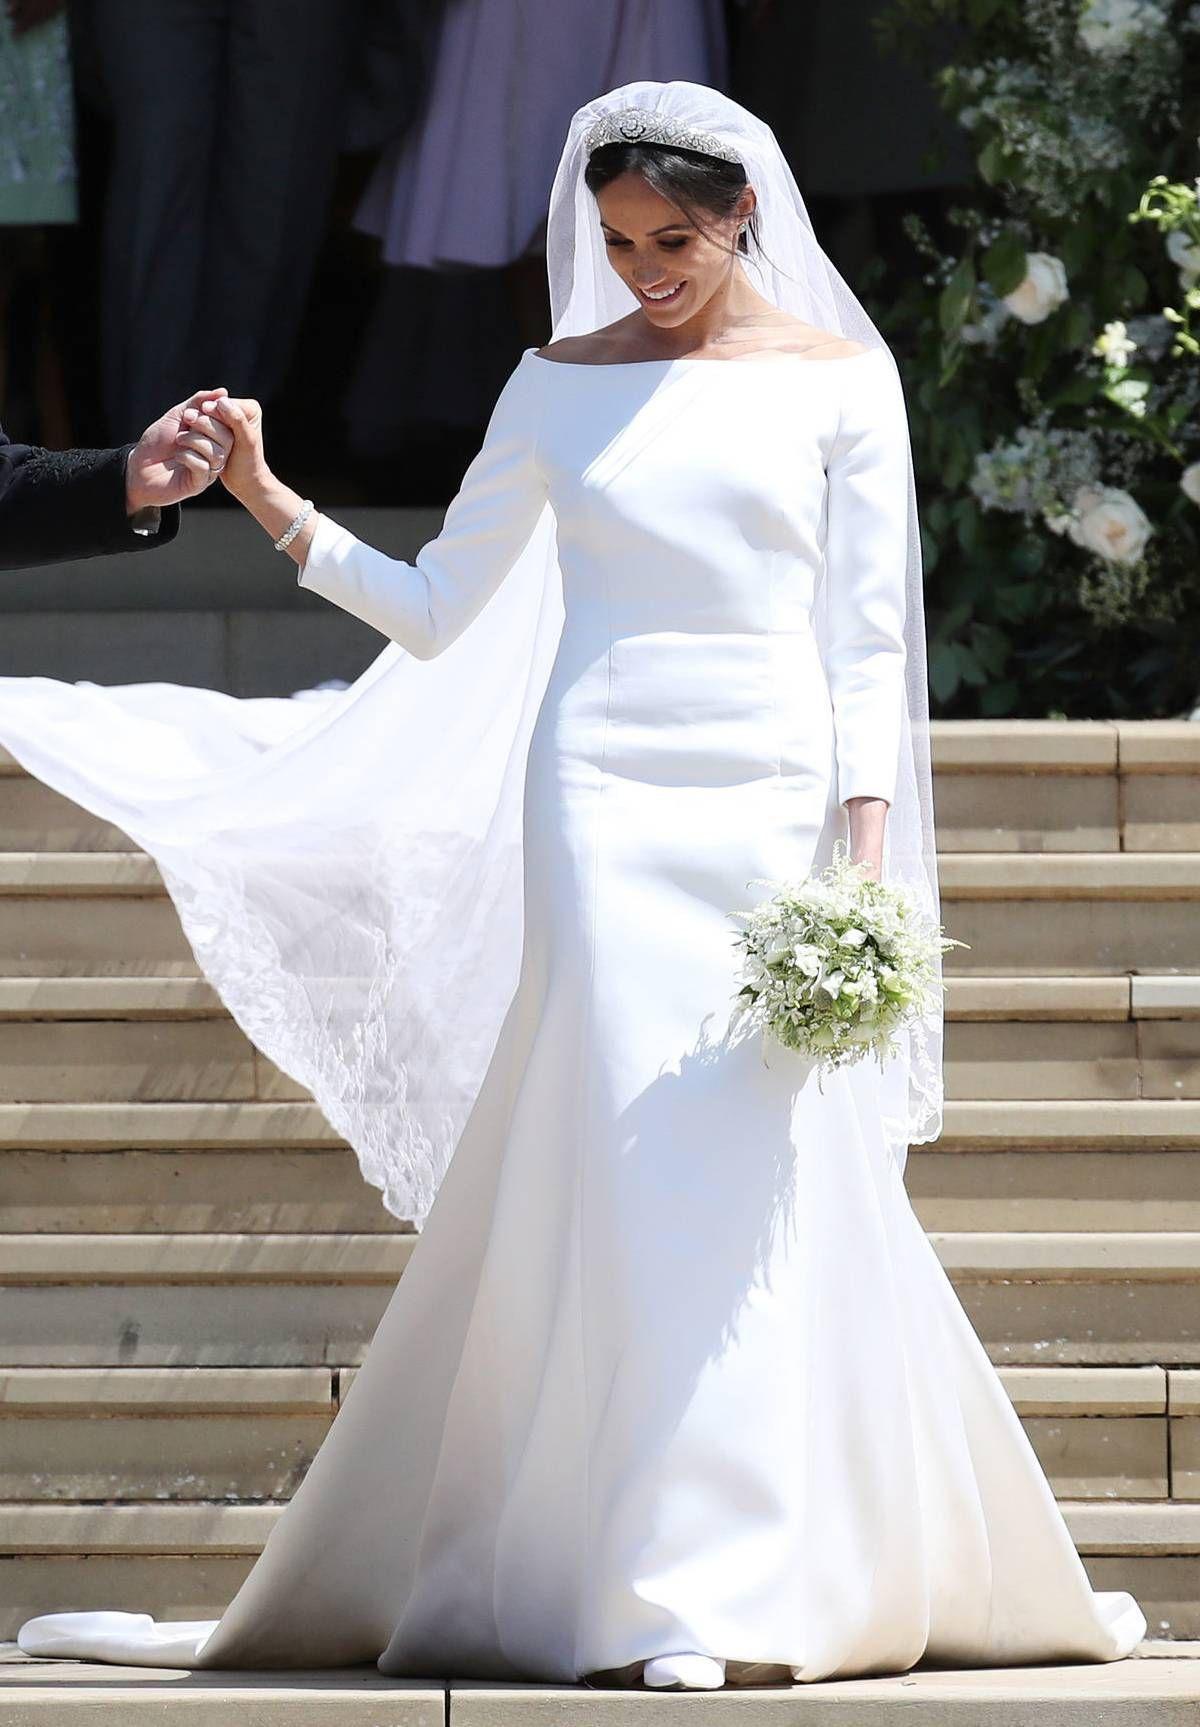 bce7c1dfa2 See Meghan Markle's Second Royal Wedding Dress | MyDomaine | Meghan ...